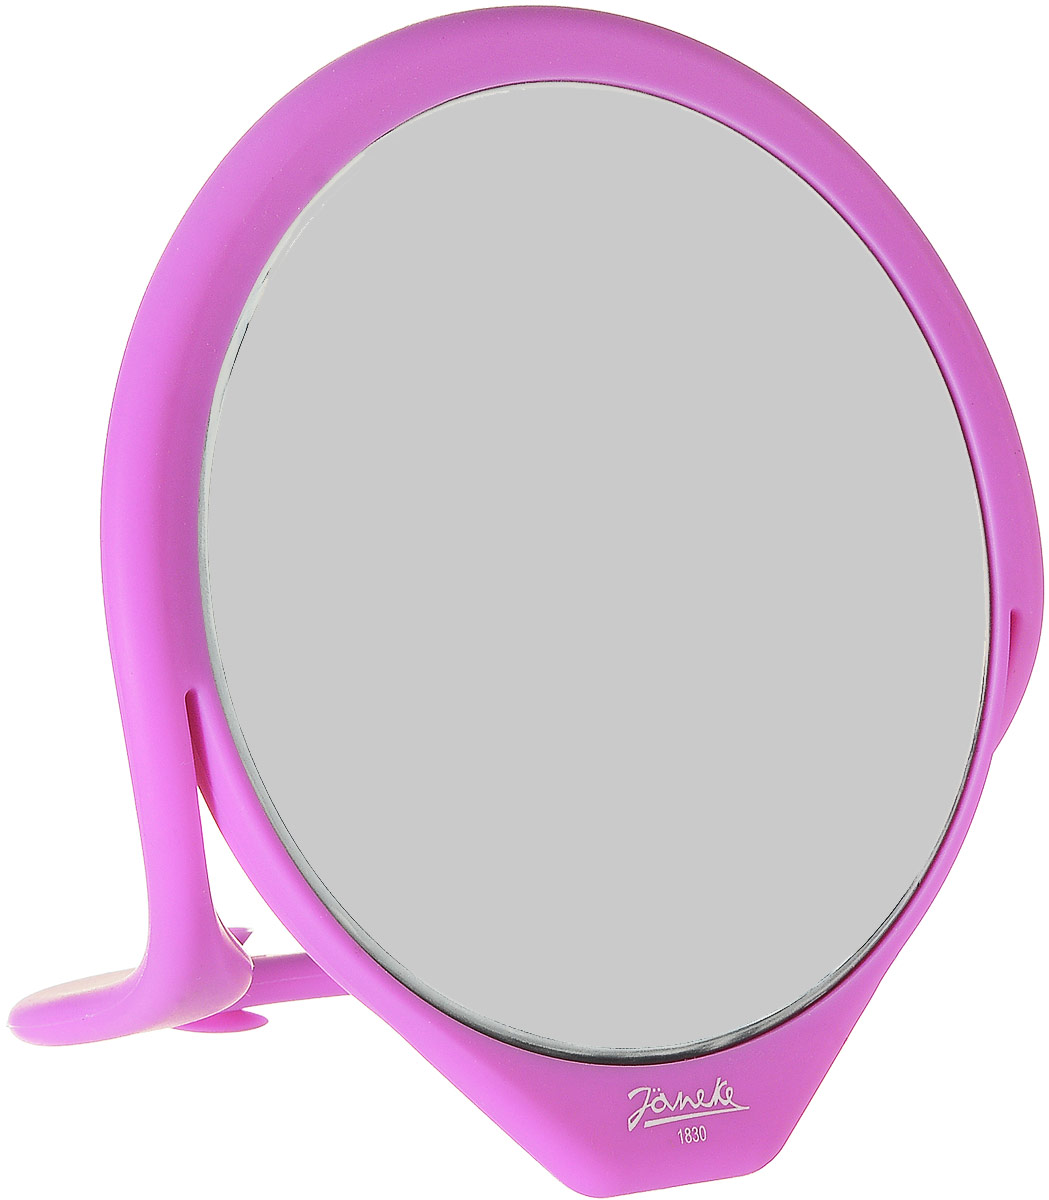 Janeke Зеркало настольное, 10445 RSA